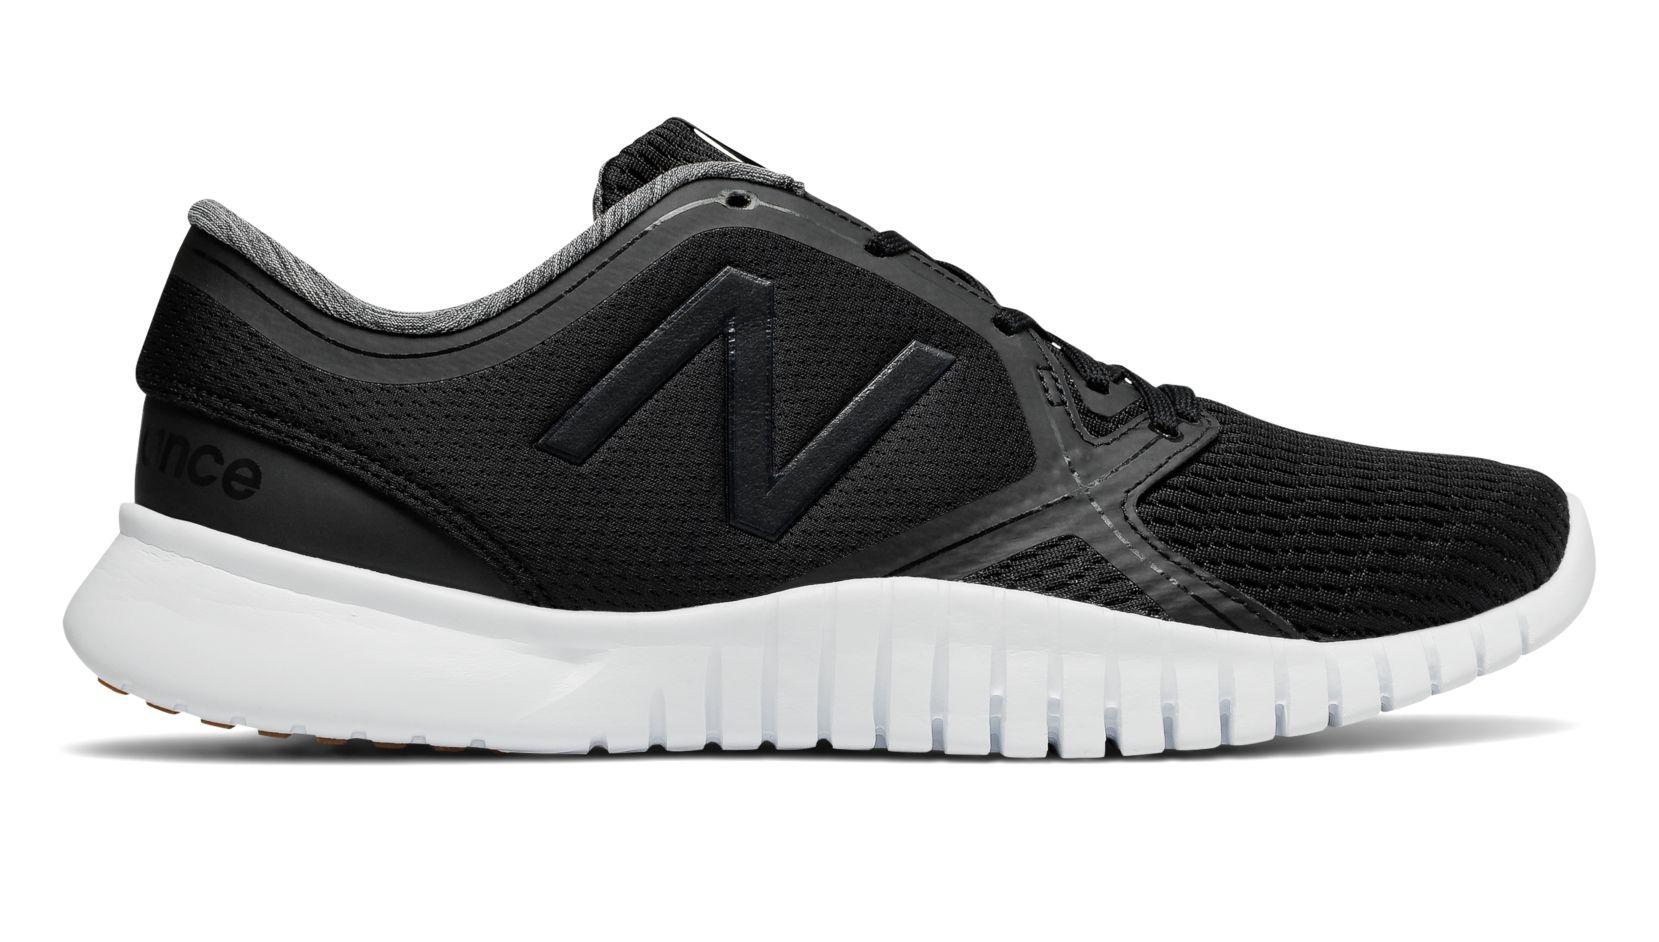 New Balance 66v2 Trainer Men - Sepatu Olahraga Pria [MX66MB2]